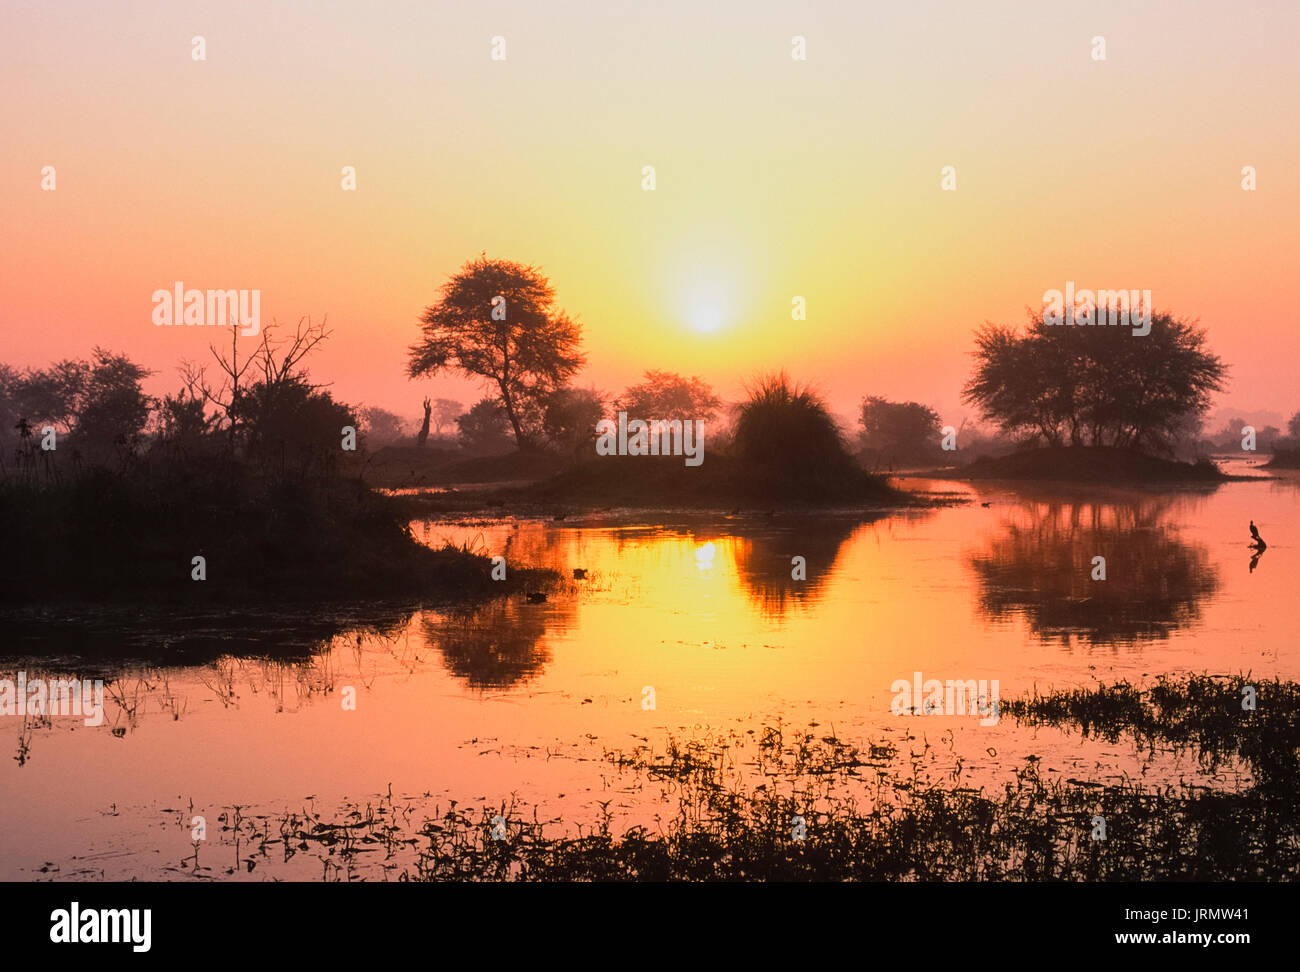 wetland reserve at sunrise, Keoladeo Ghana National Park, Bharatpur, Rajasthan, India - Stock Image